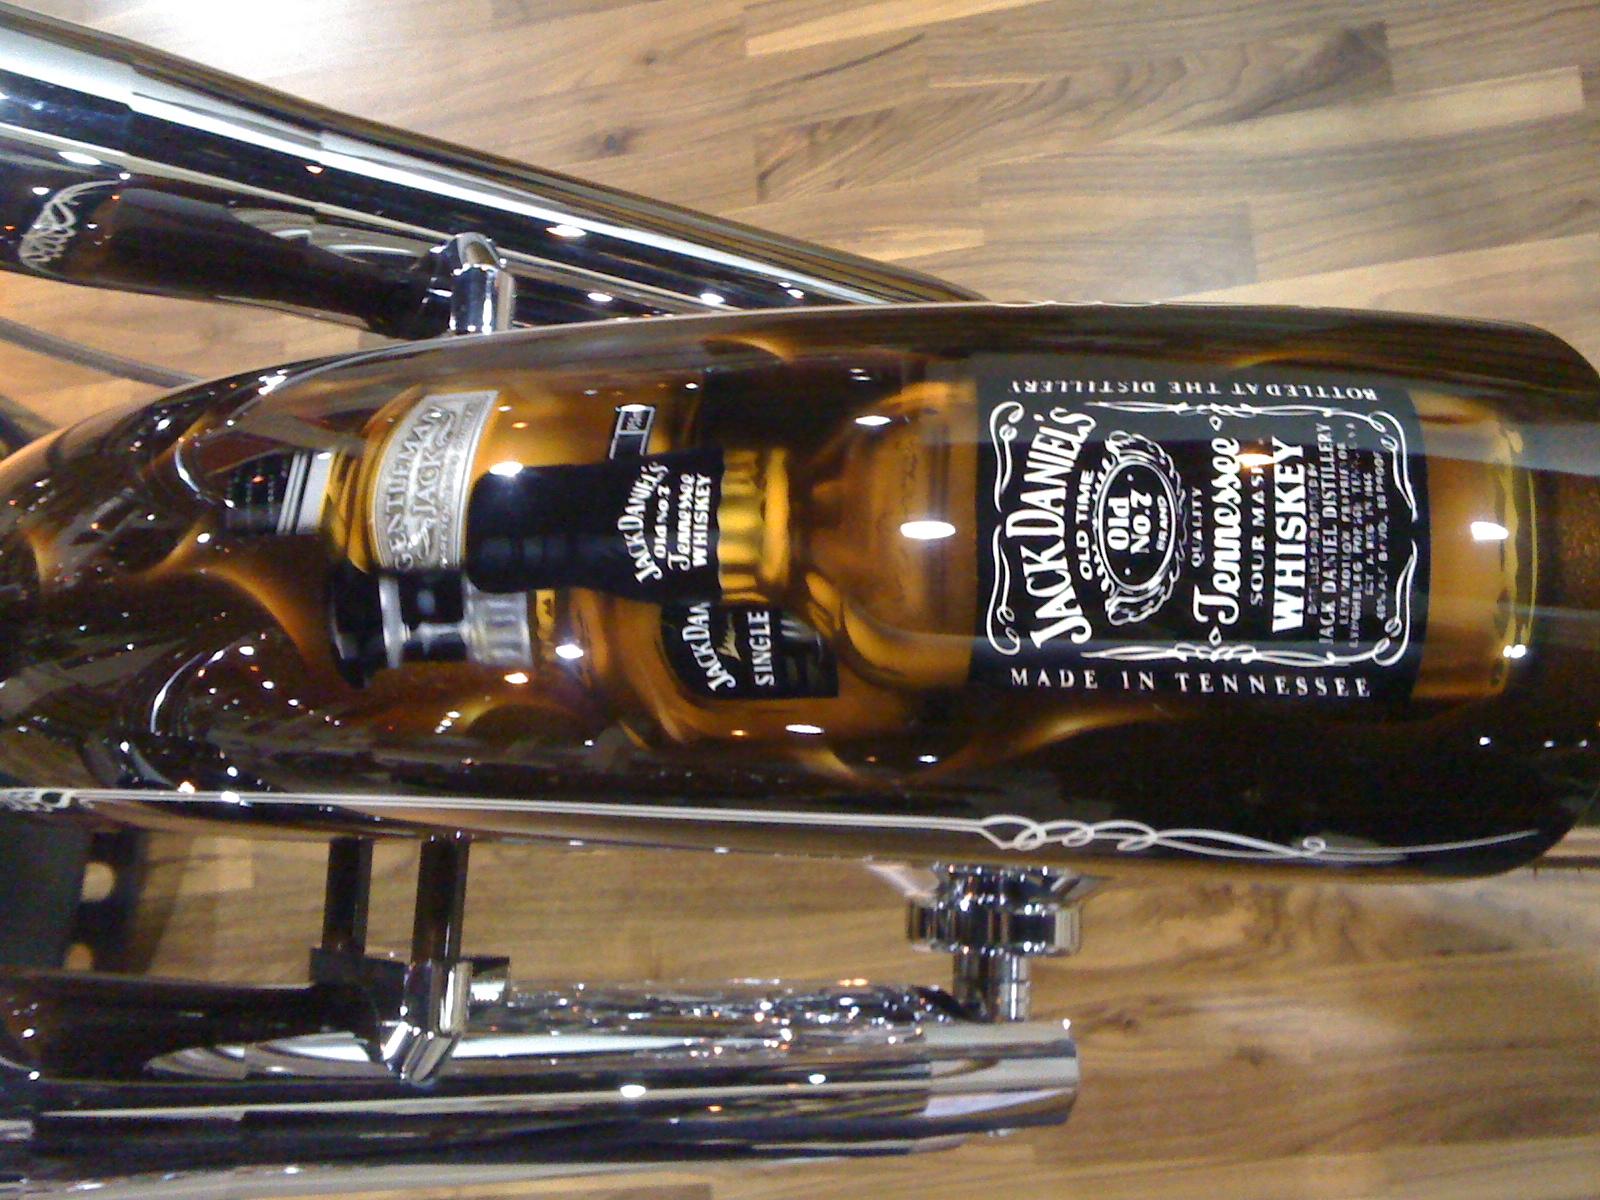 Jack Daniel's Custom Motorcycles 1600 x 1200 · 1985 kB · jpeg